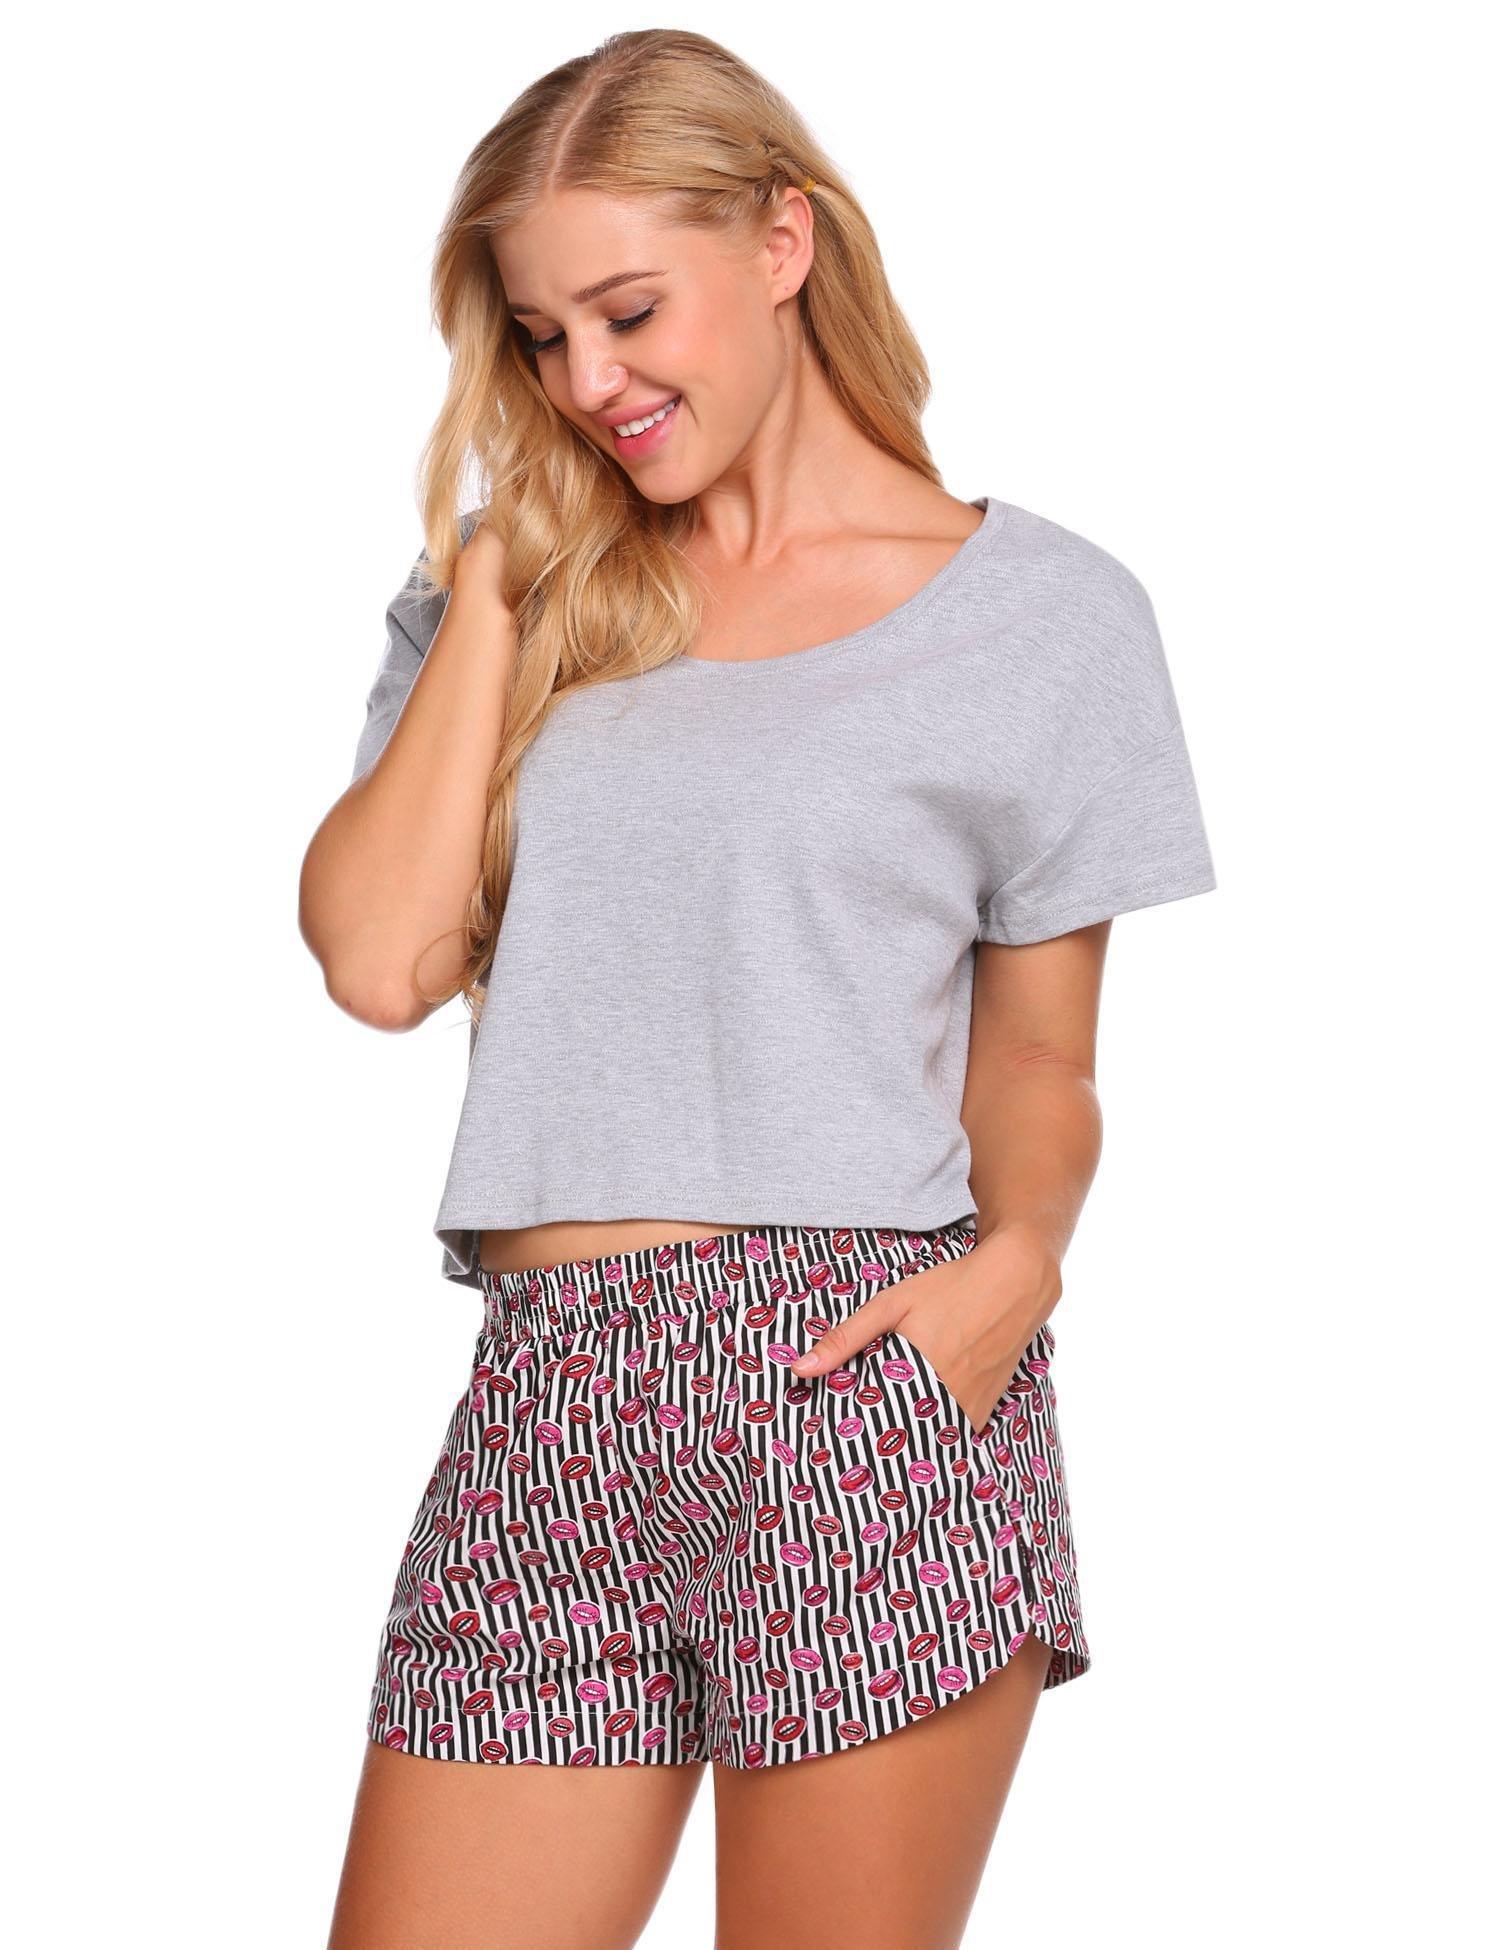 Ekouaer Womens 2 Piece Pajama Set Short Sleeve Crop Top and Print Pj Shorts (Gray and Striped, XL)